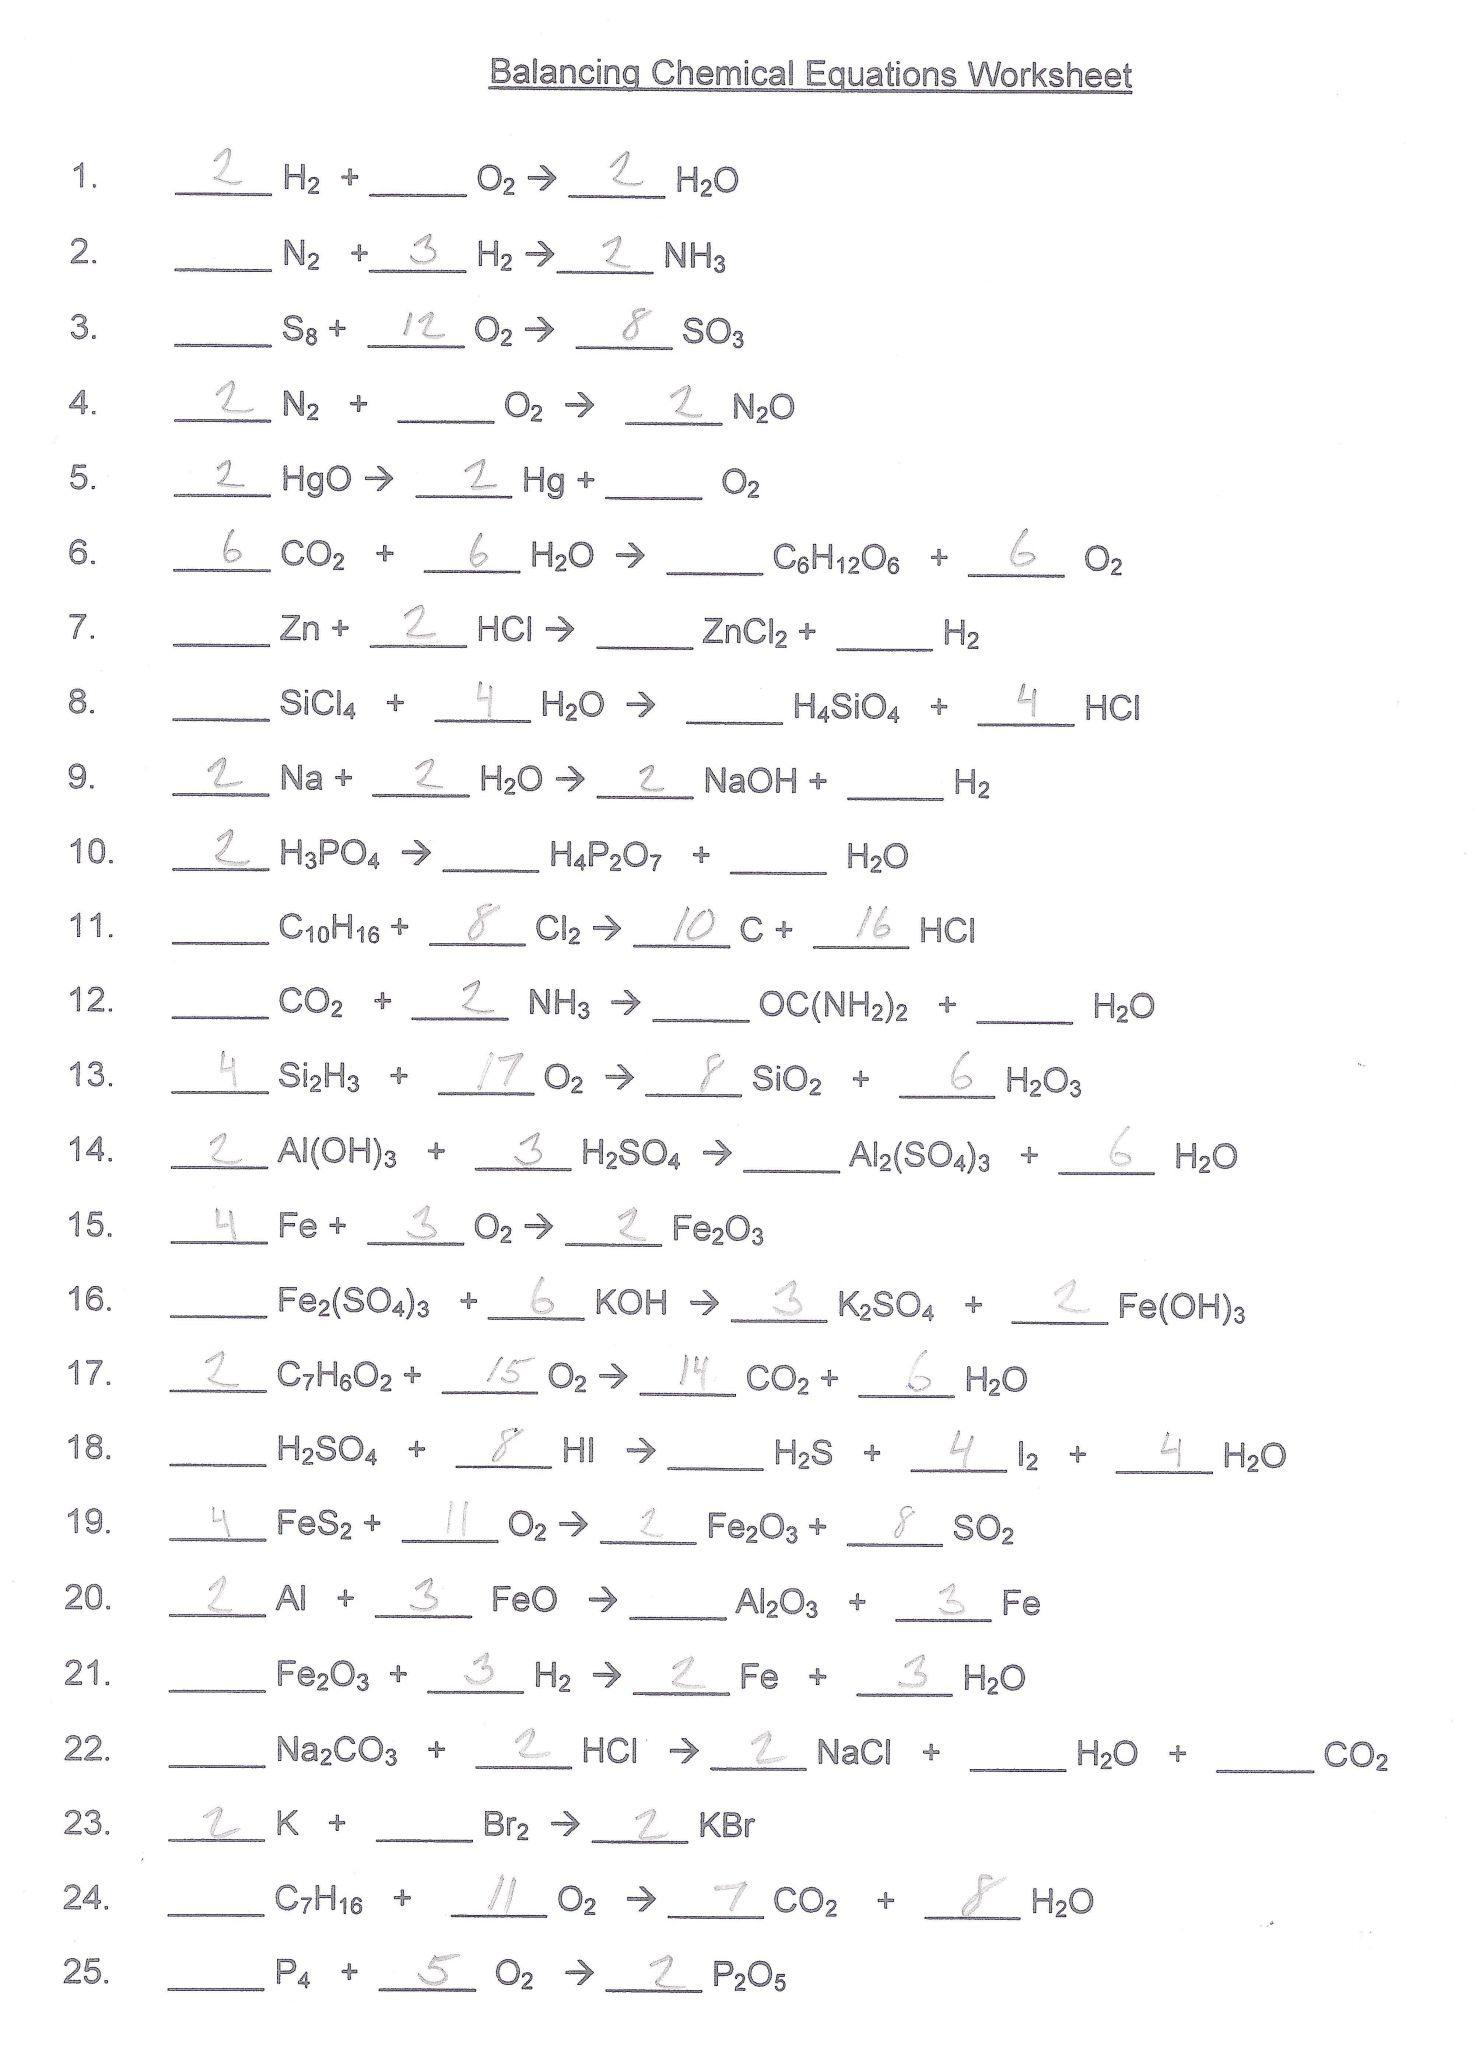 Chemistry Unit 7 Worksheet 4 Answers